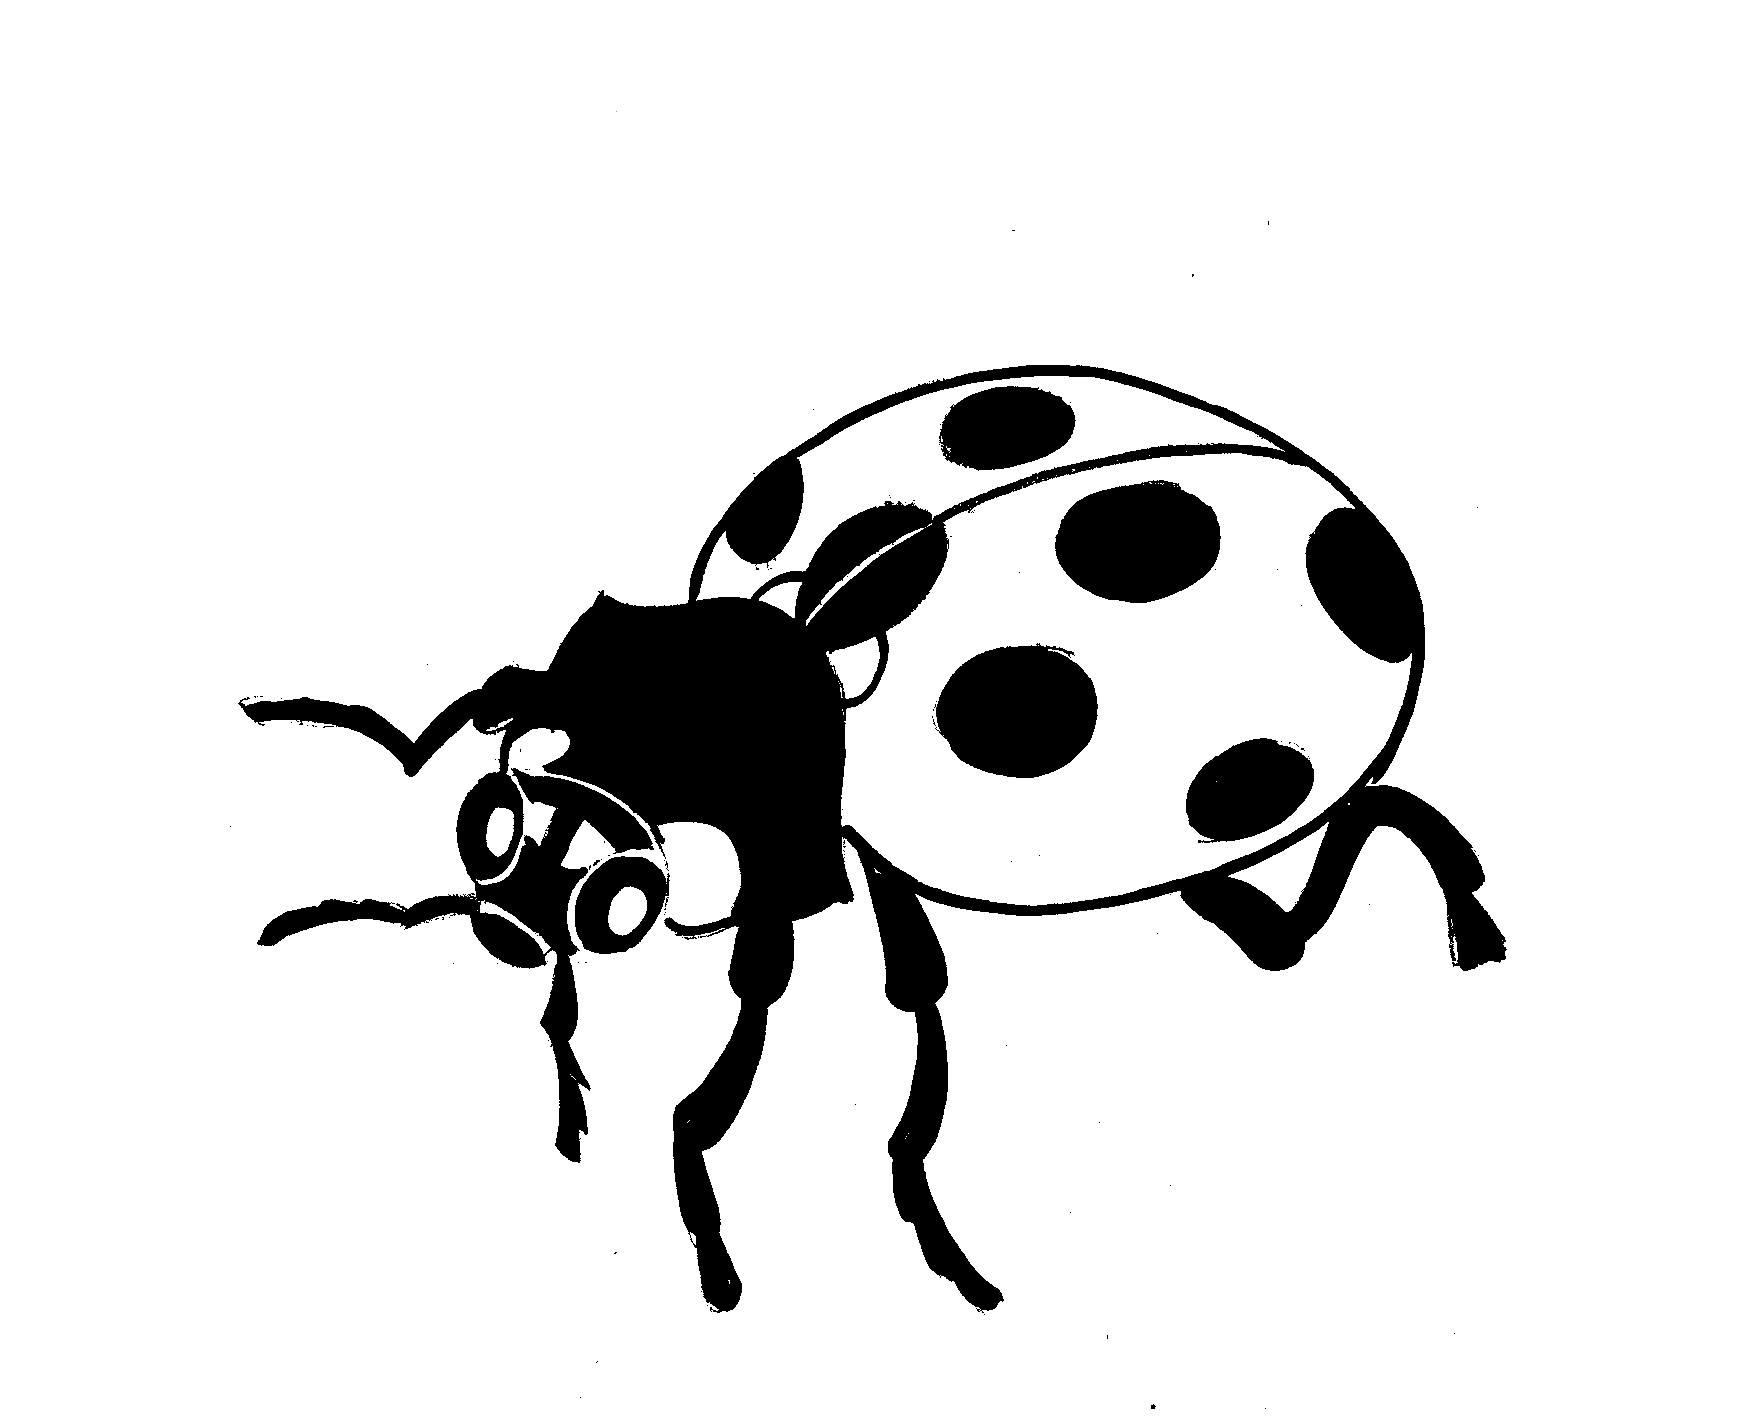 Ladybug Pencil Drawing